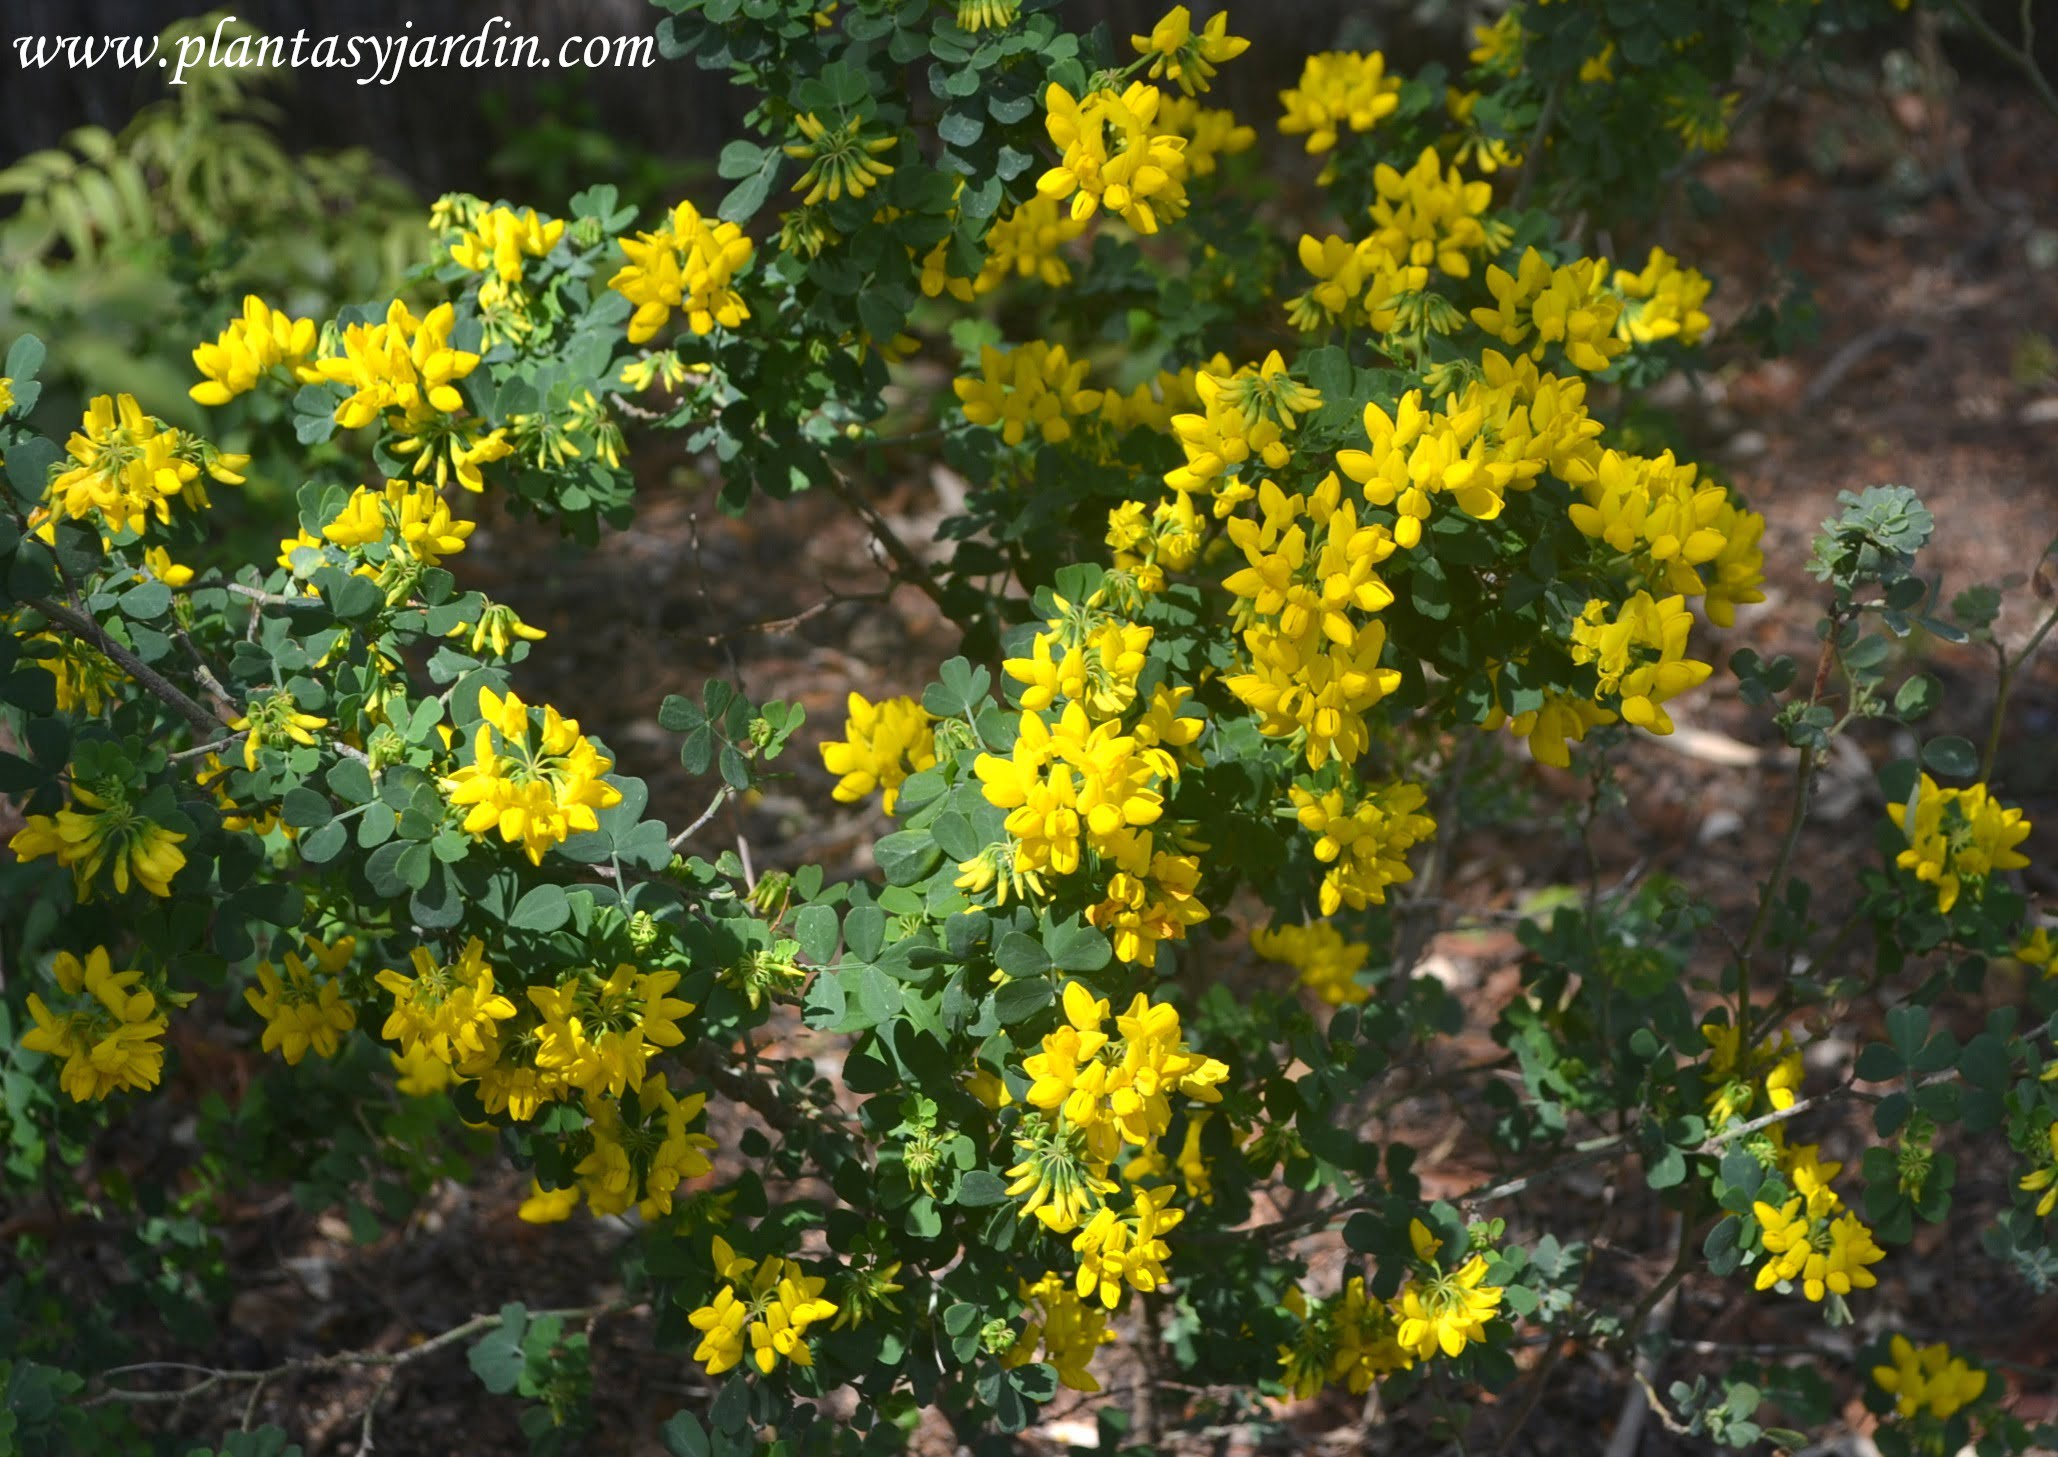 Coronilla glauca florecida a comienzos de la primavera